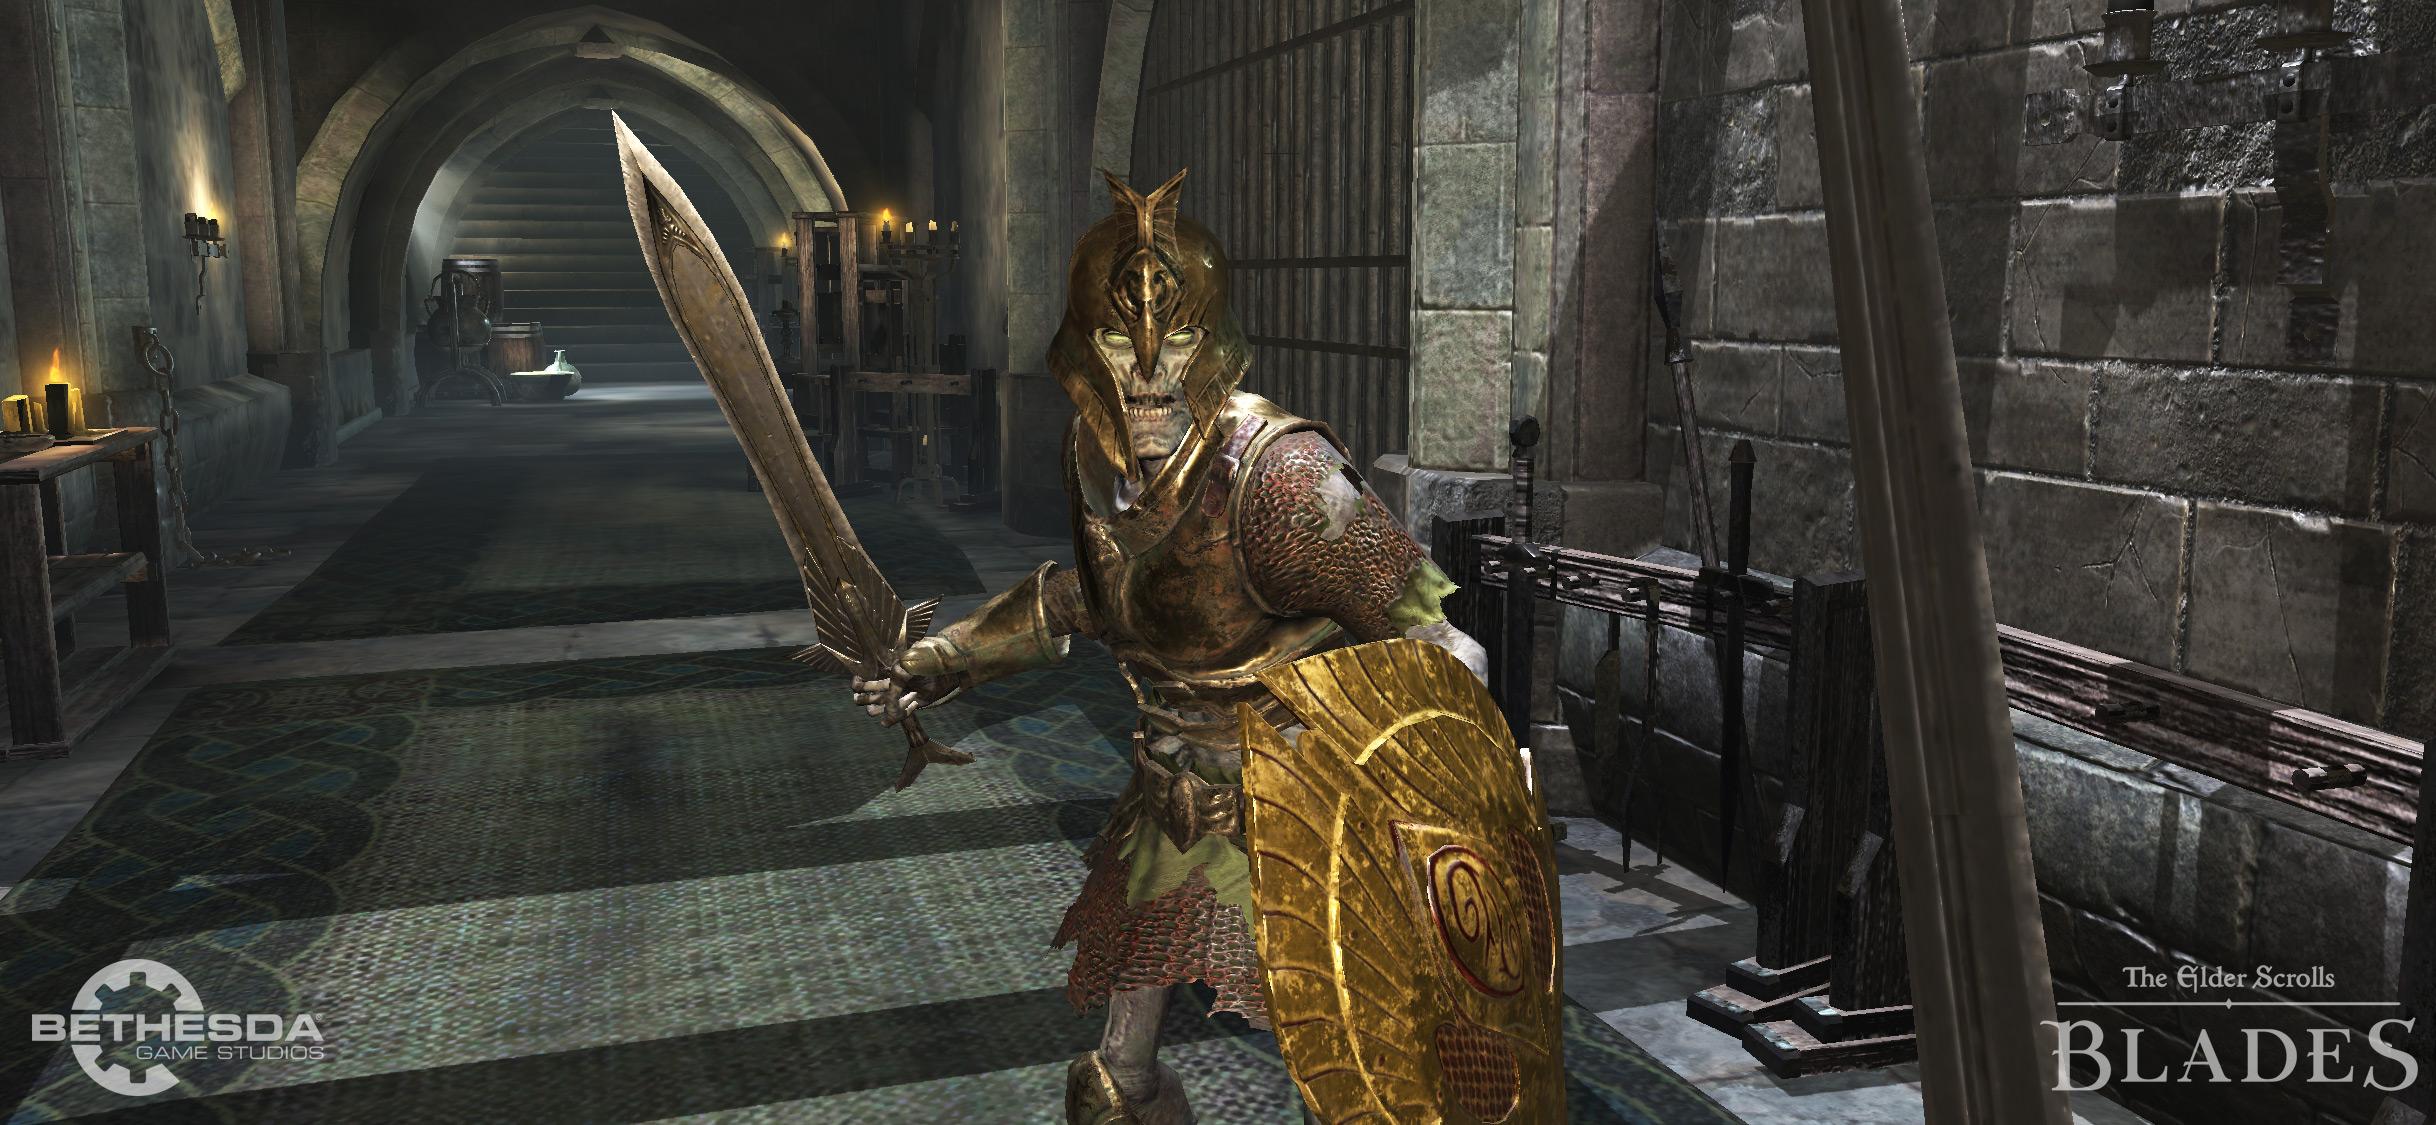 The Elder Scrolls: Blades slips into 2019 screenshot